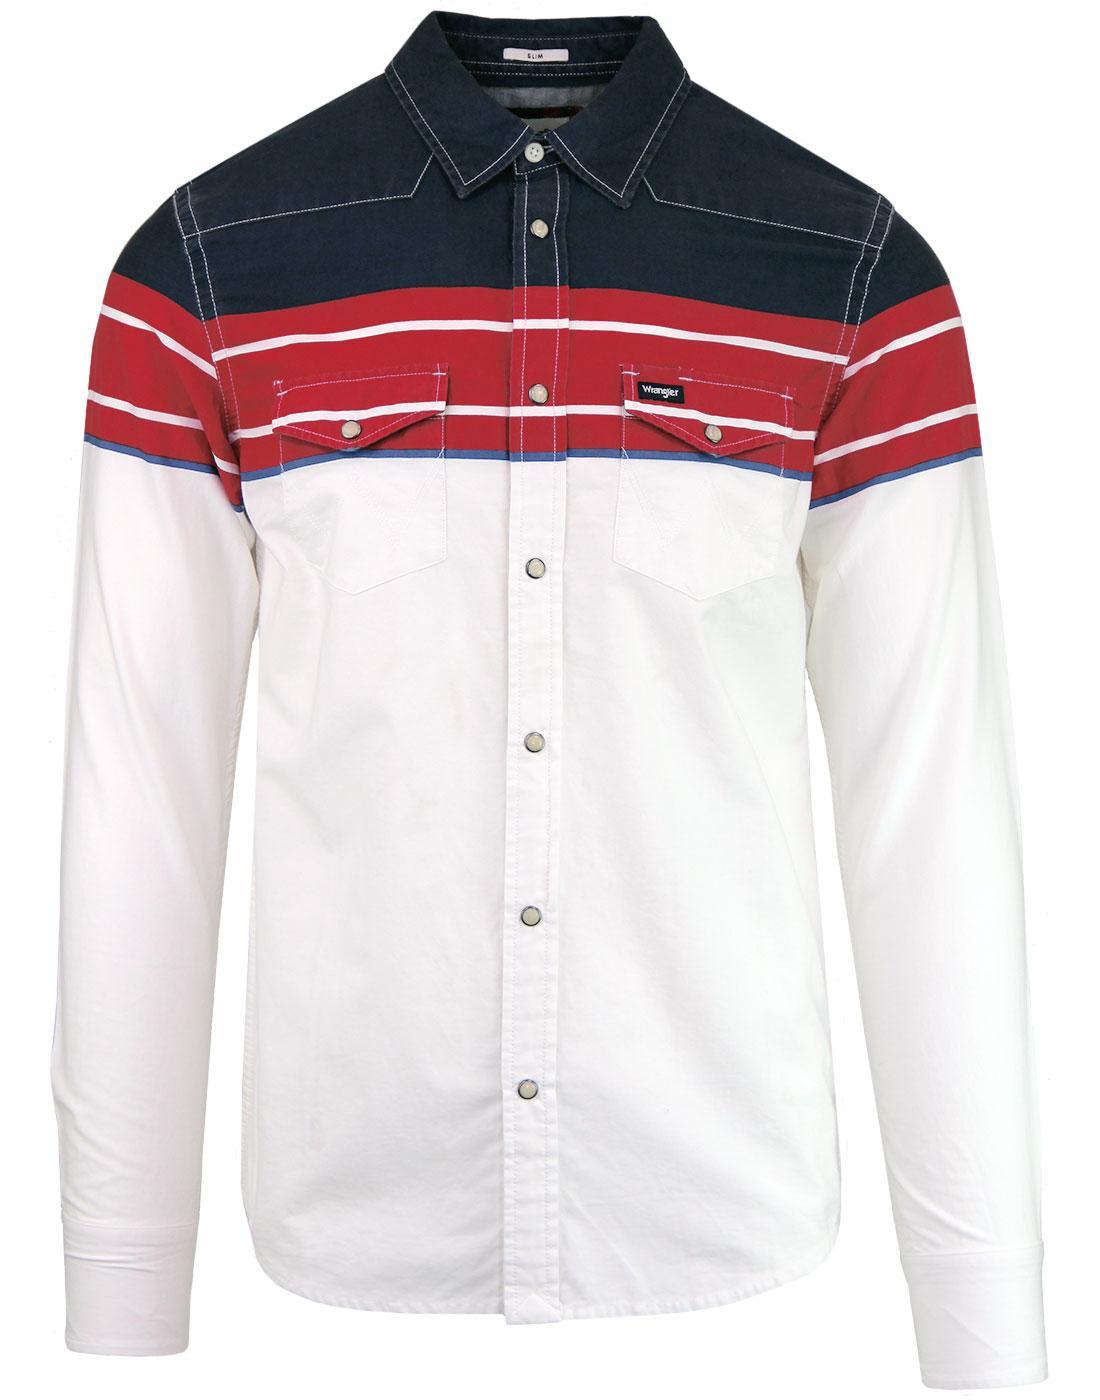 WRANGLER Retro Indie Block Colour Western Shirt